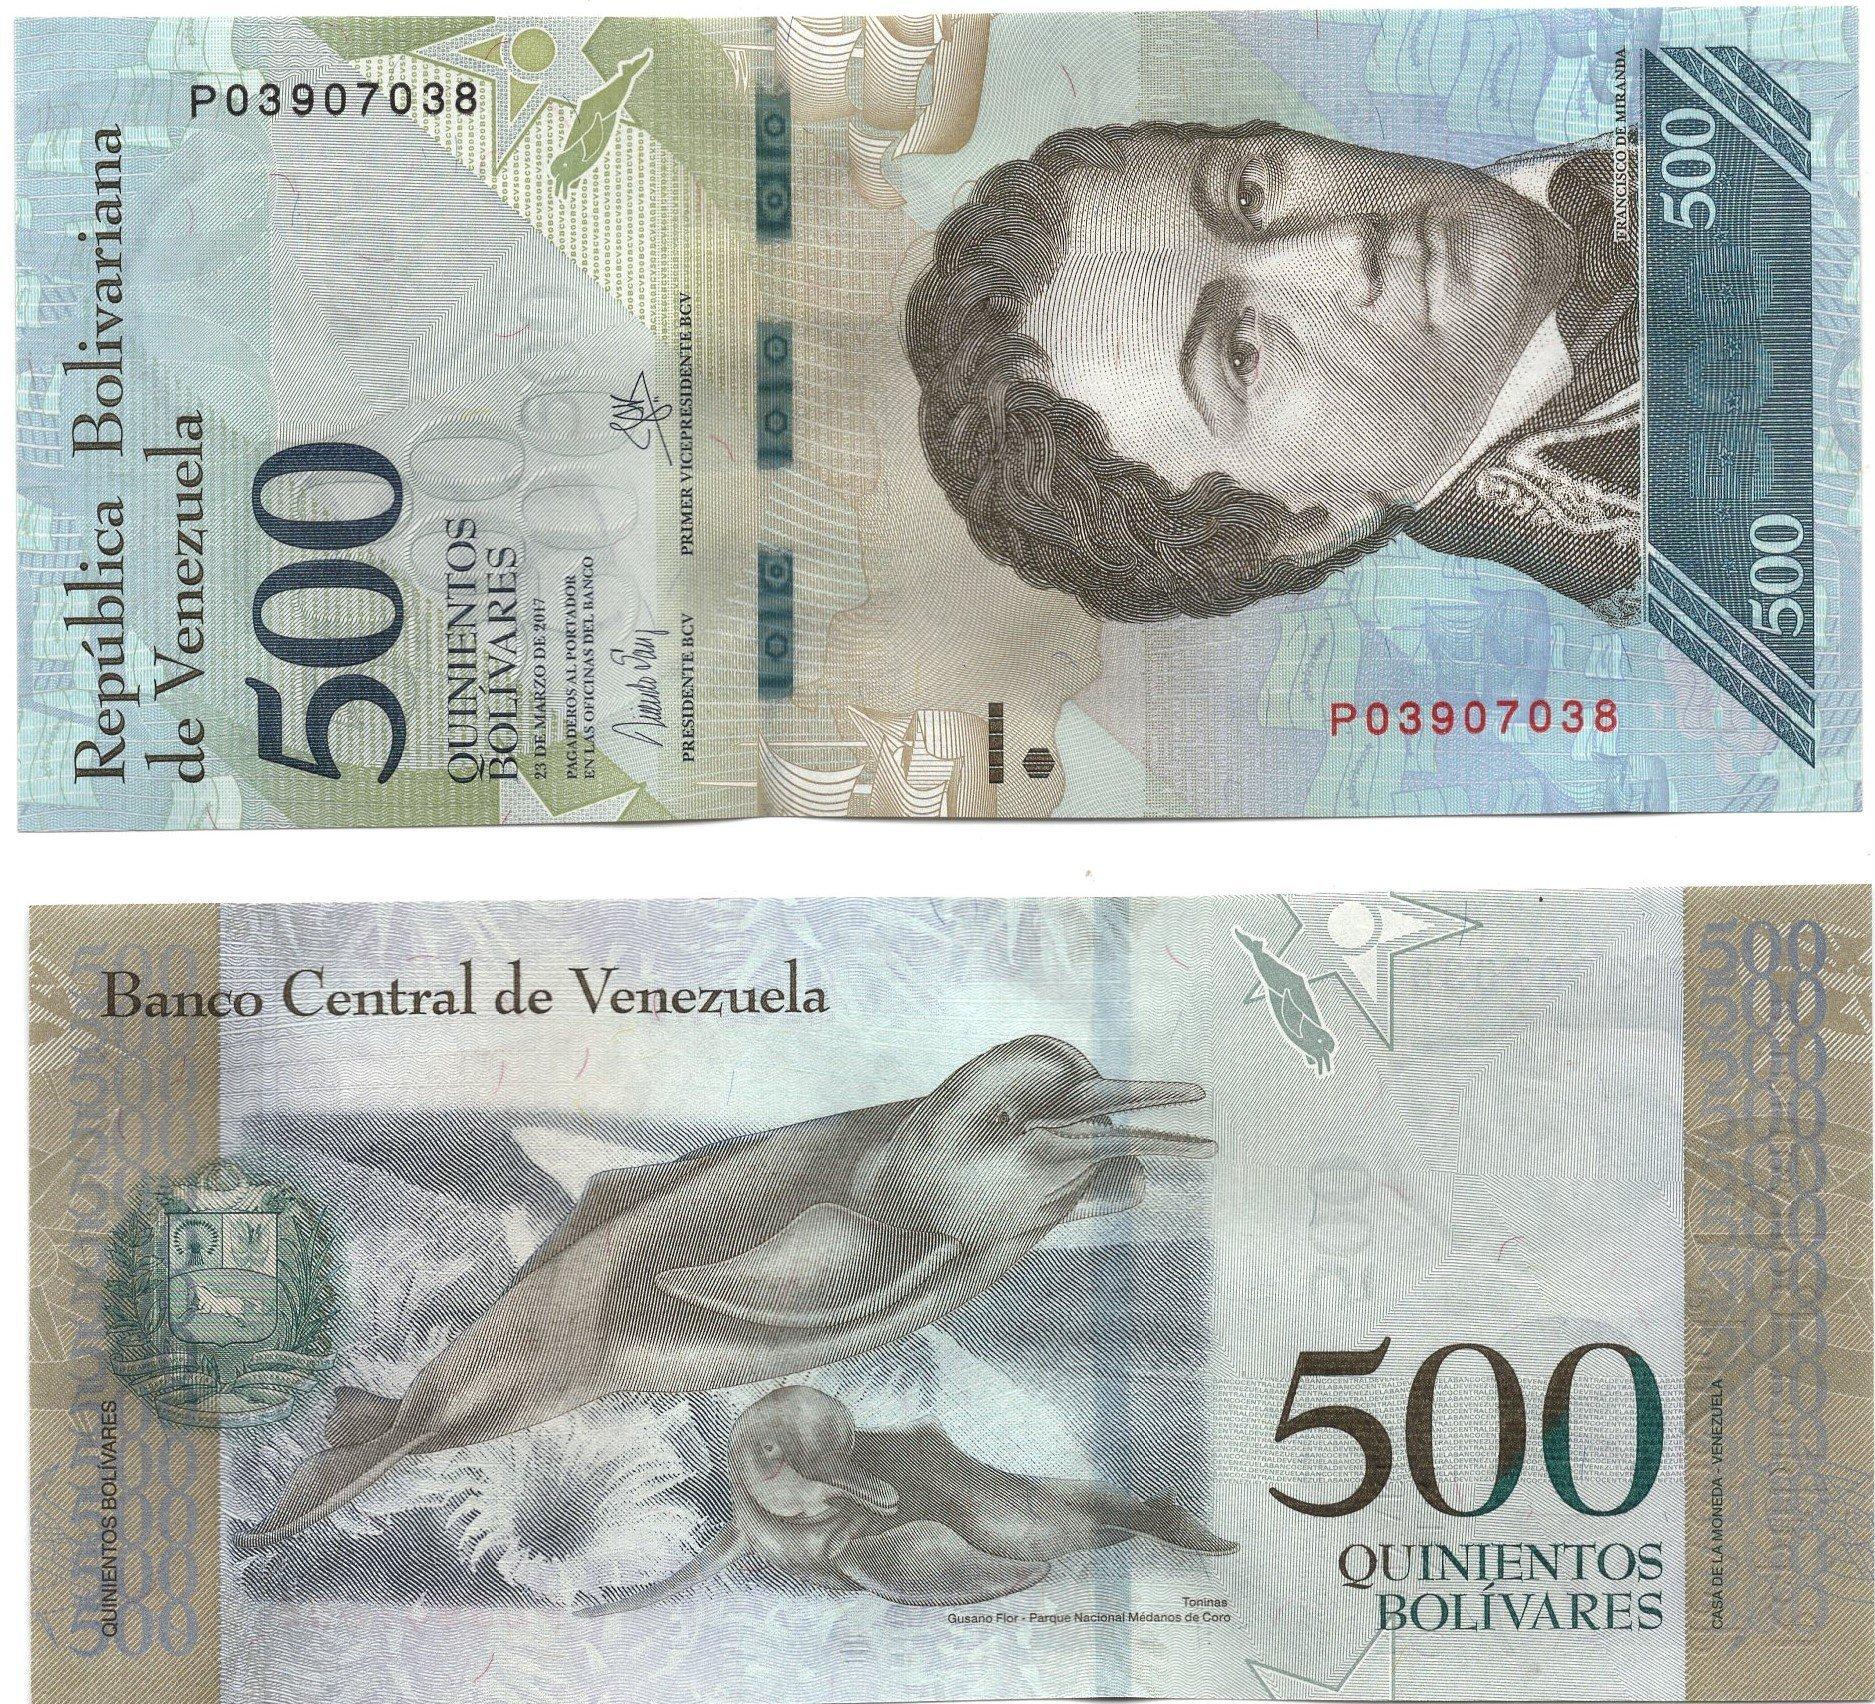 venezuela 500 bolivares banknote for sale